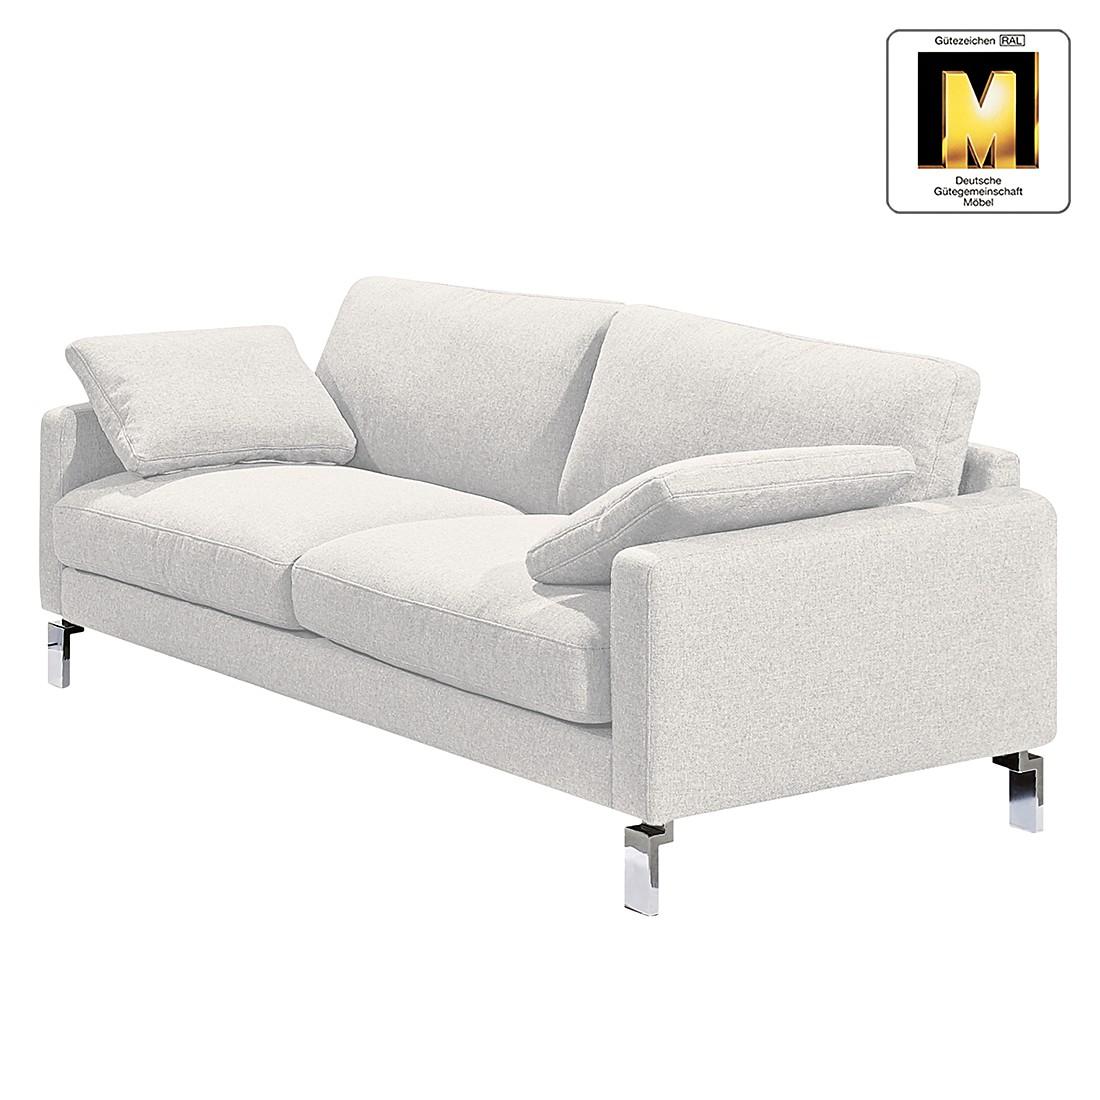 Sofa Casual Line IV (3-Sitzer) – Velours – Hellgrau, Claas Claasen bestellen